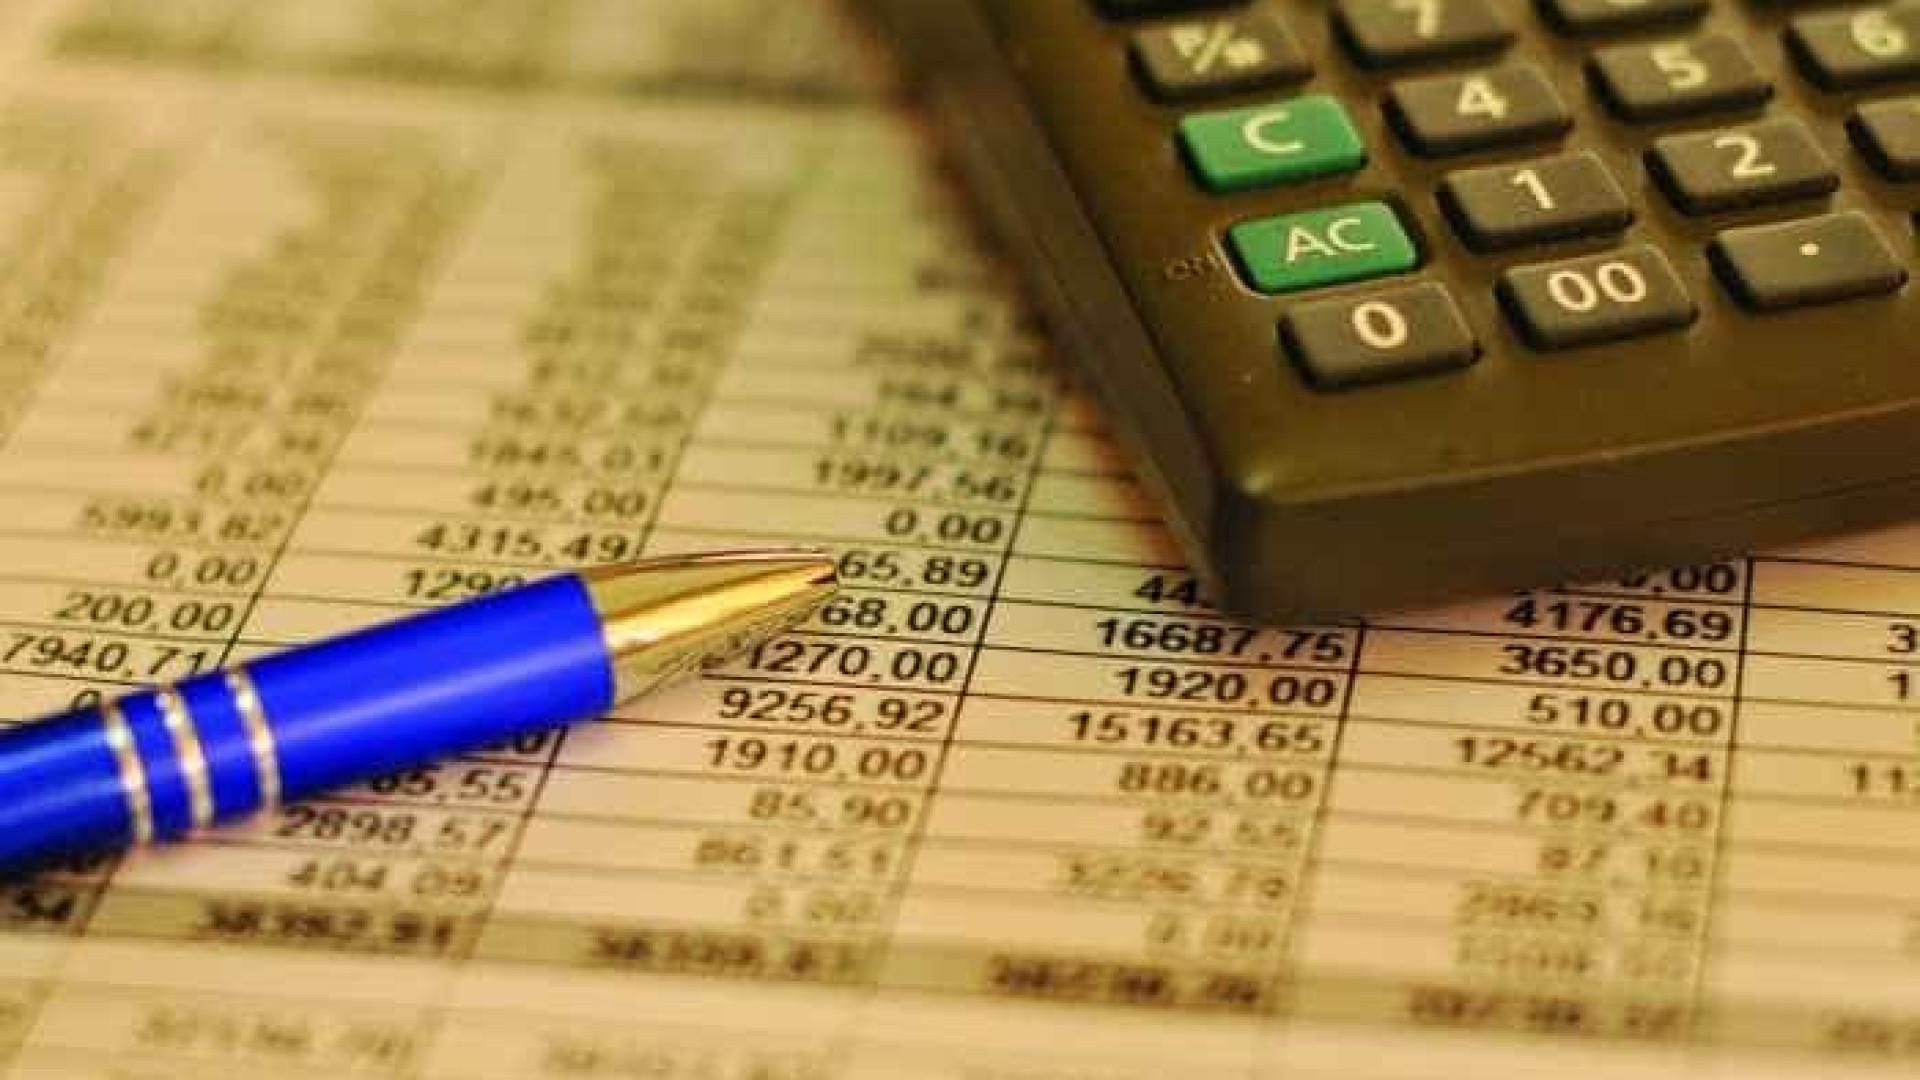 Mesmo após débito prescrever, devedor quer pagar a conta